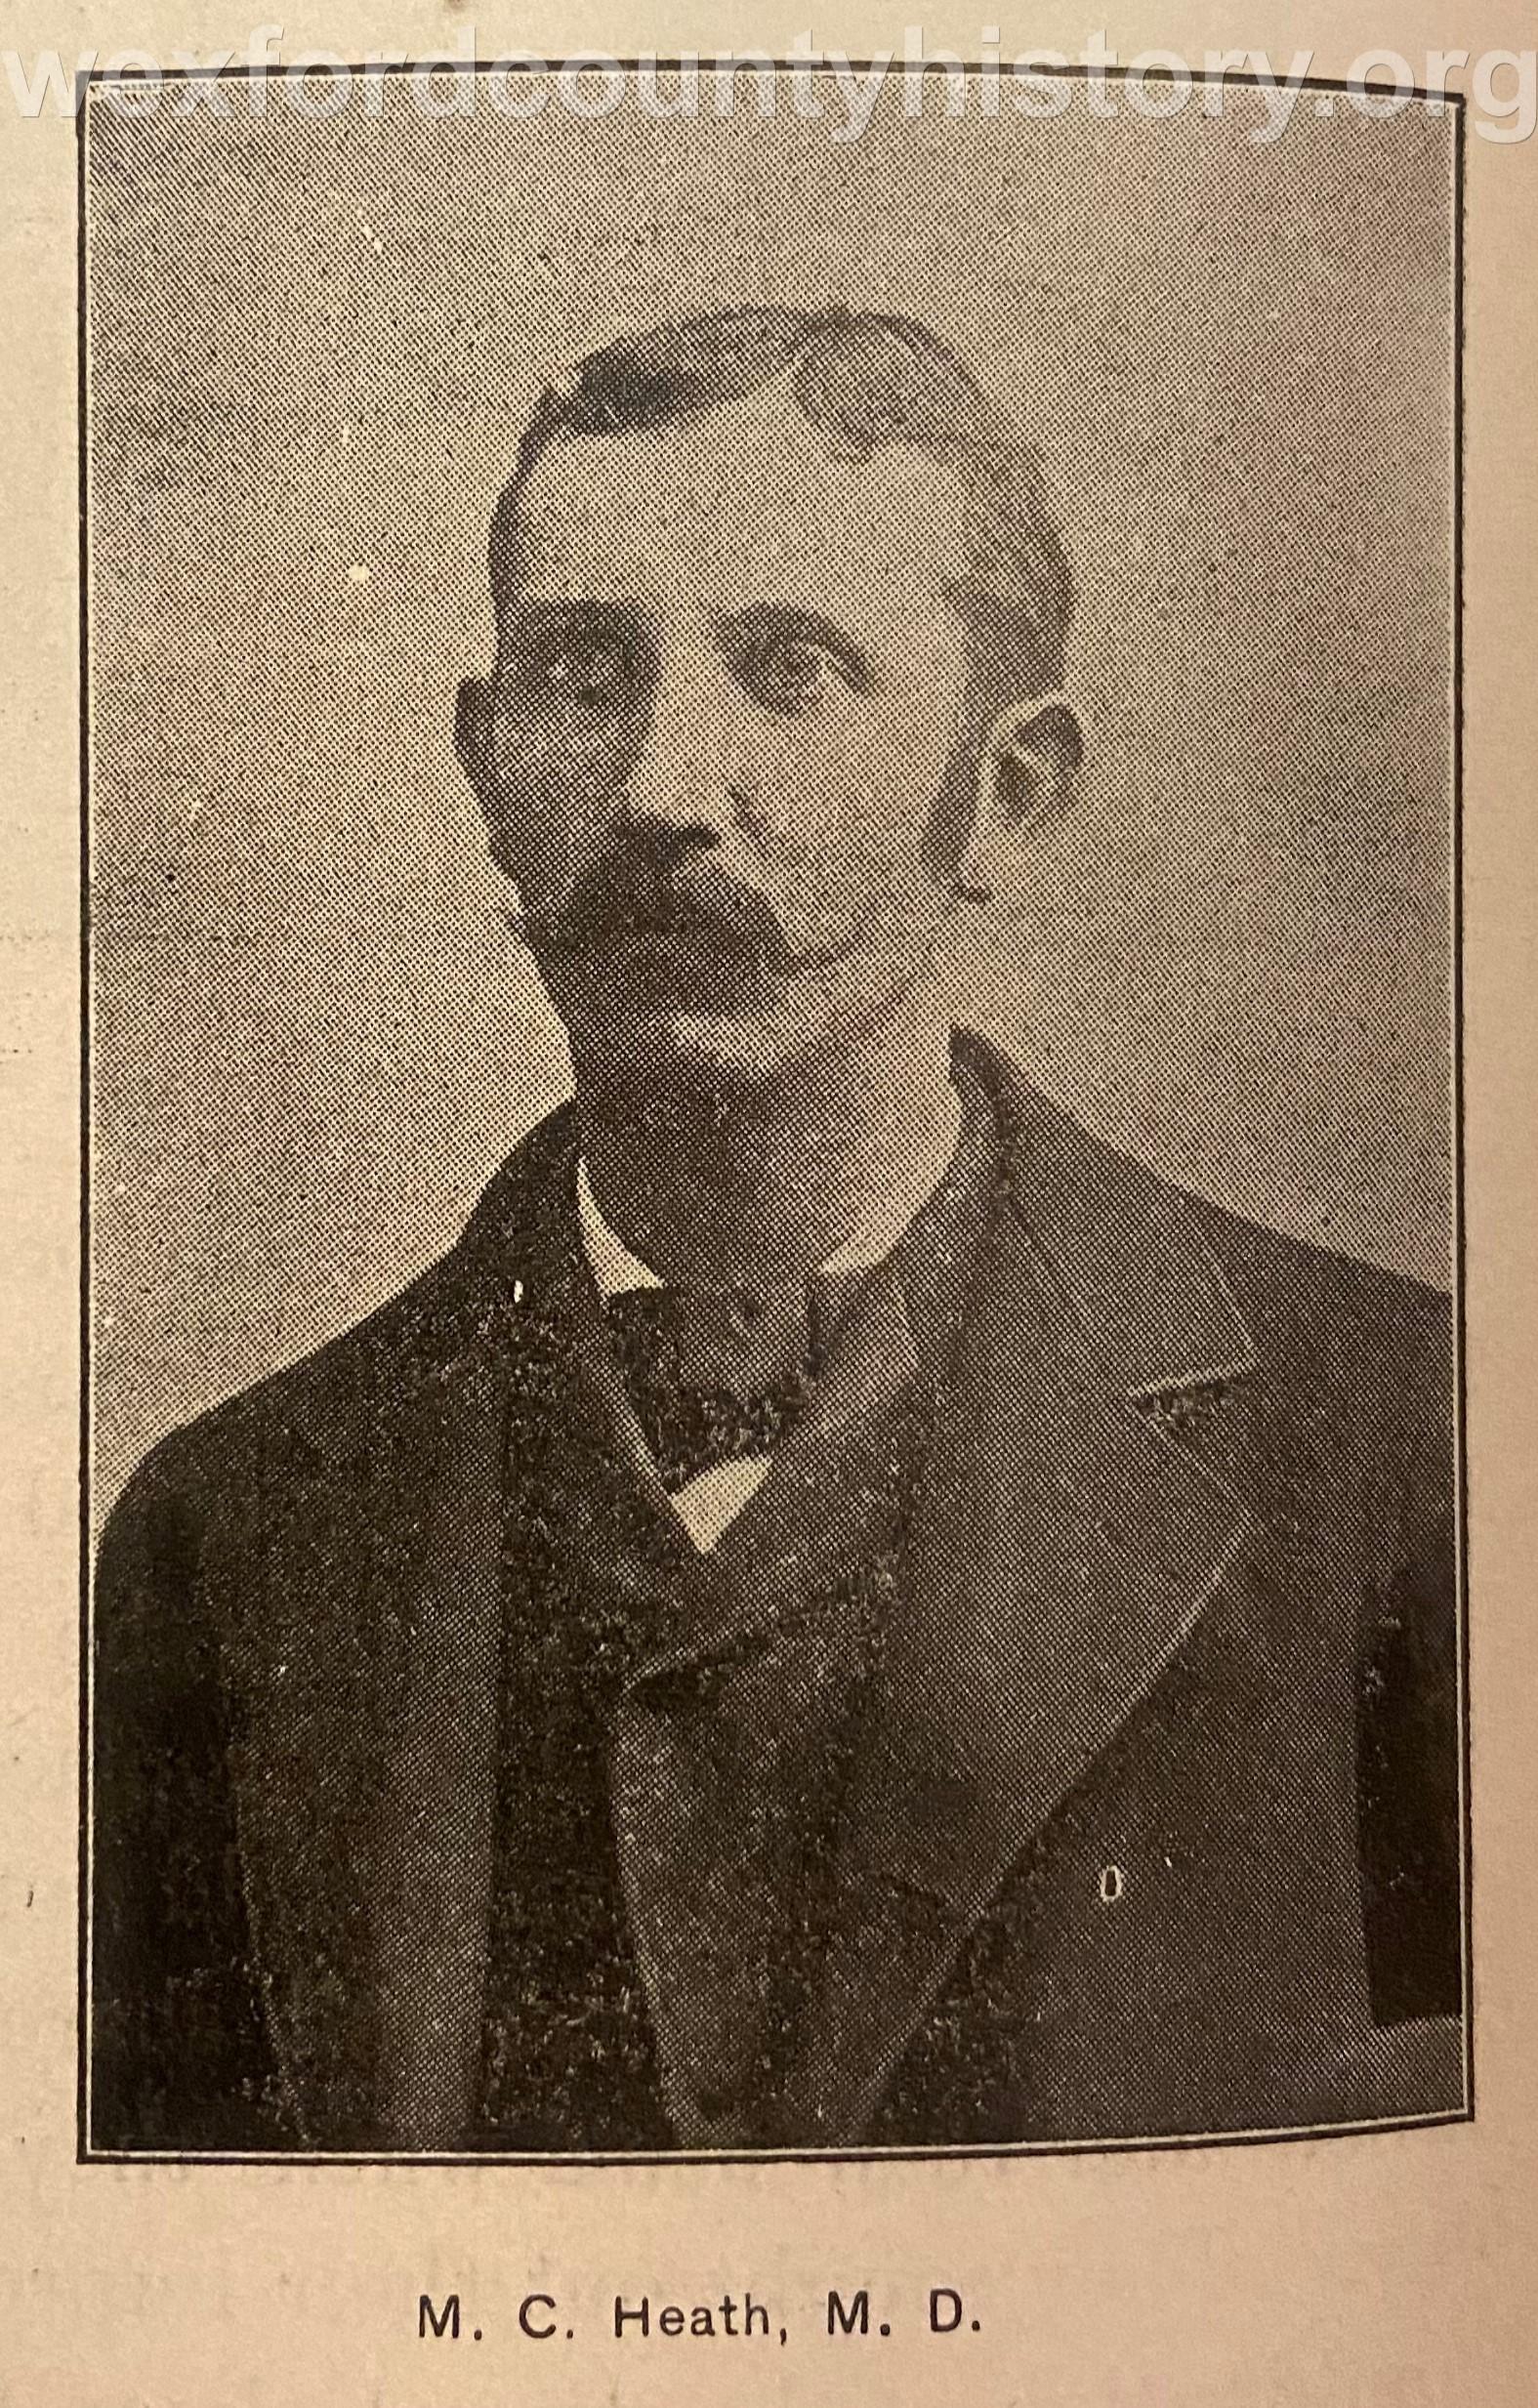 Dr. M. C. Heath